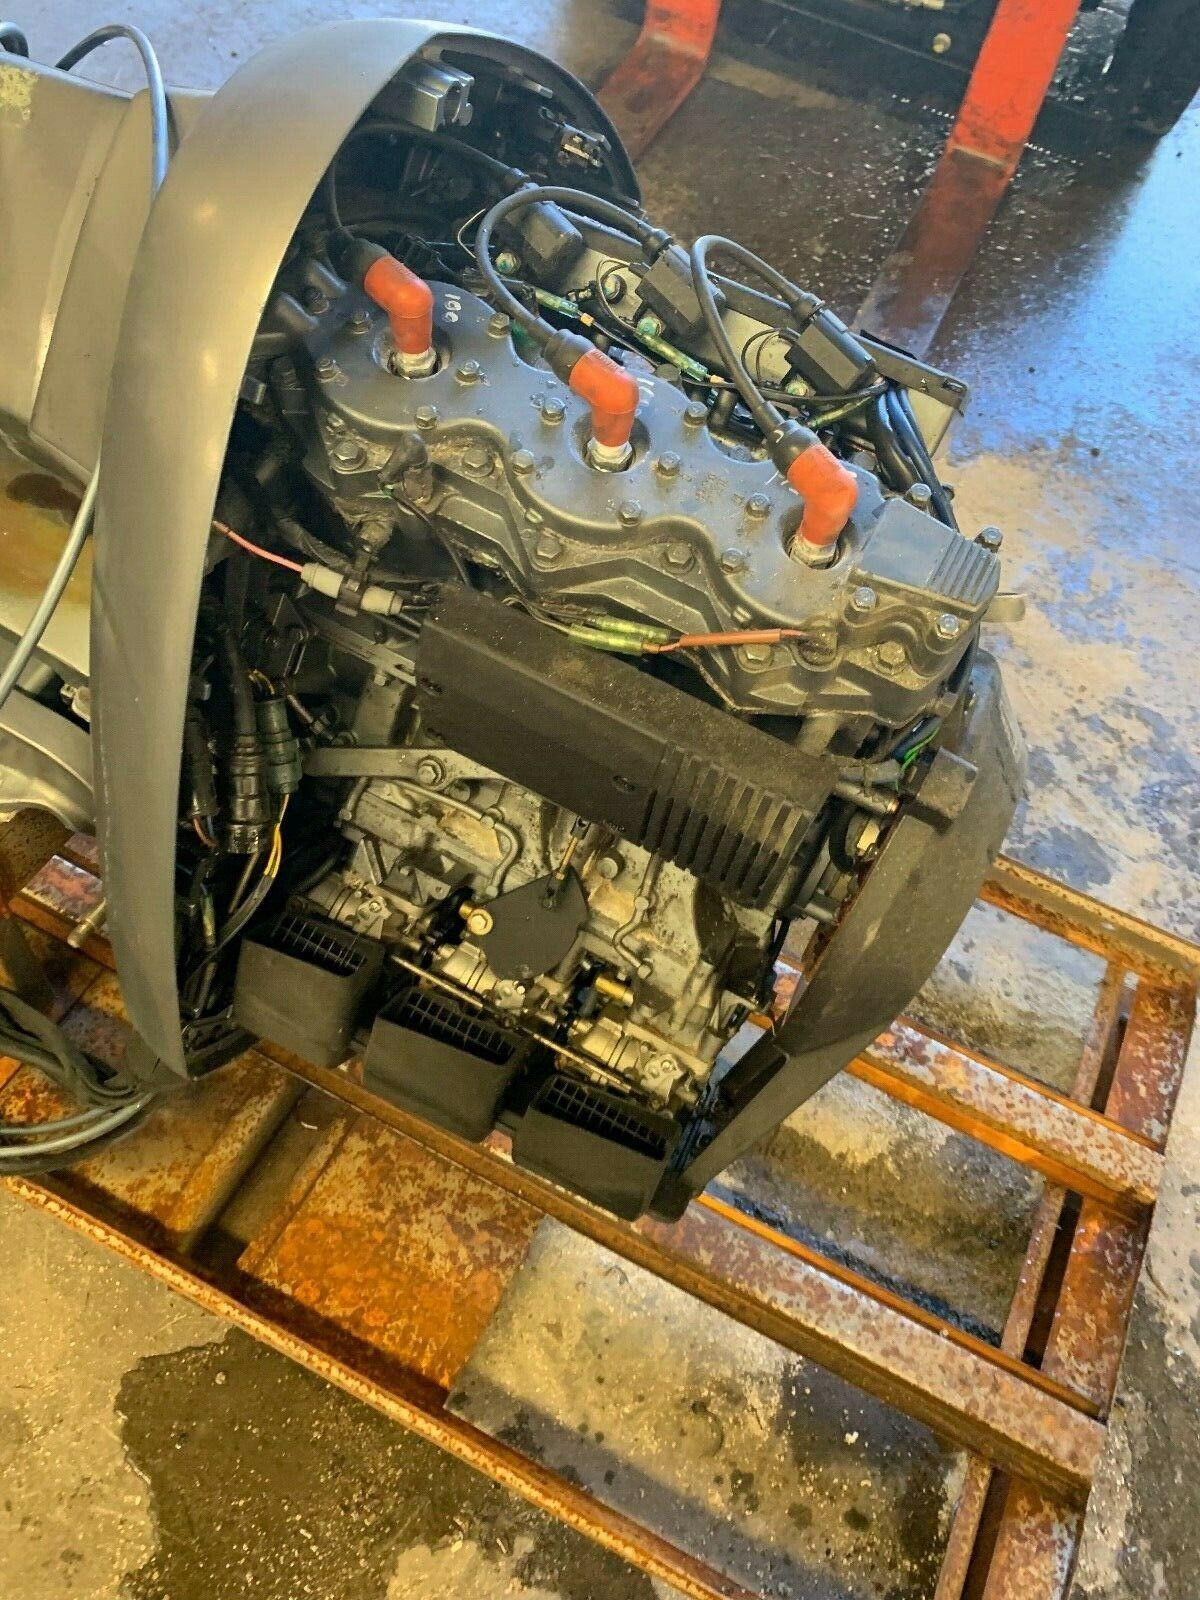 1992 Yamaha 225 Carbureted Carb 2-Stroke 25 Εξωλέμβιες μηχανές σκαφών V6 200